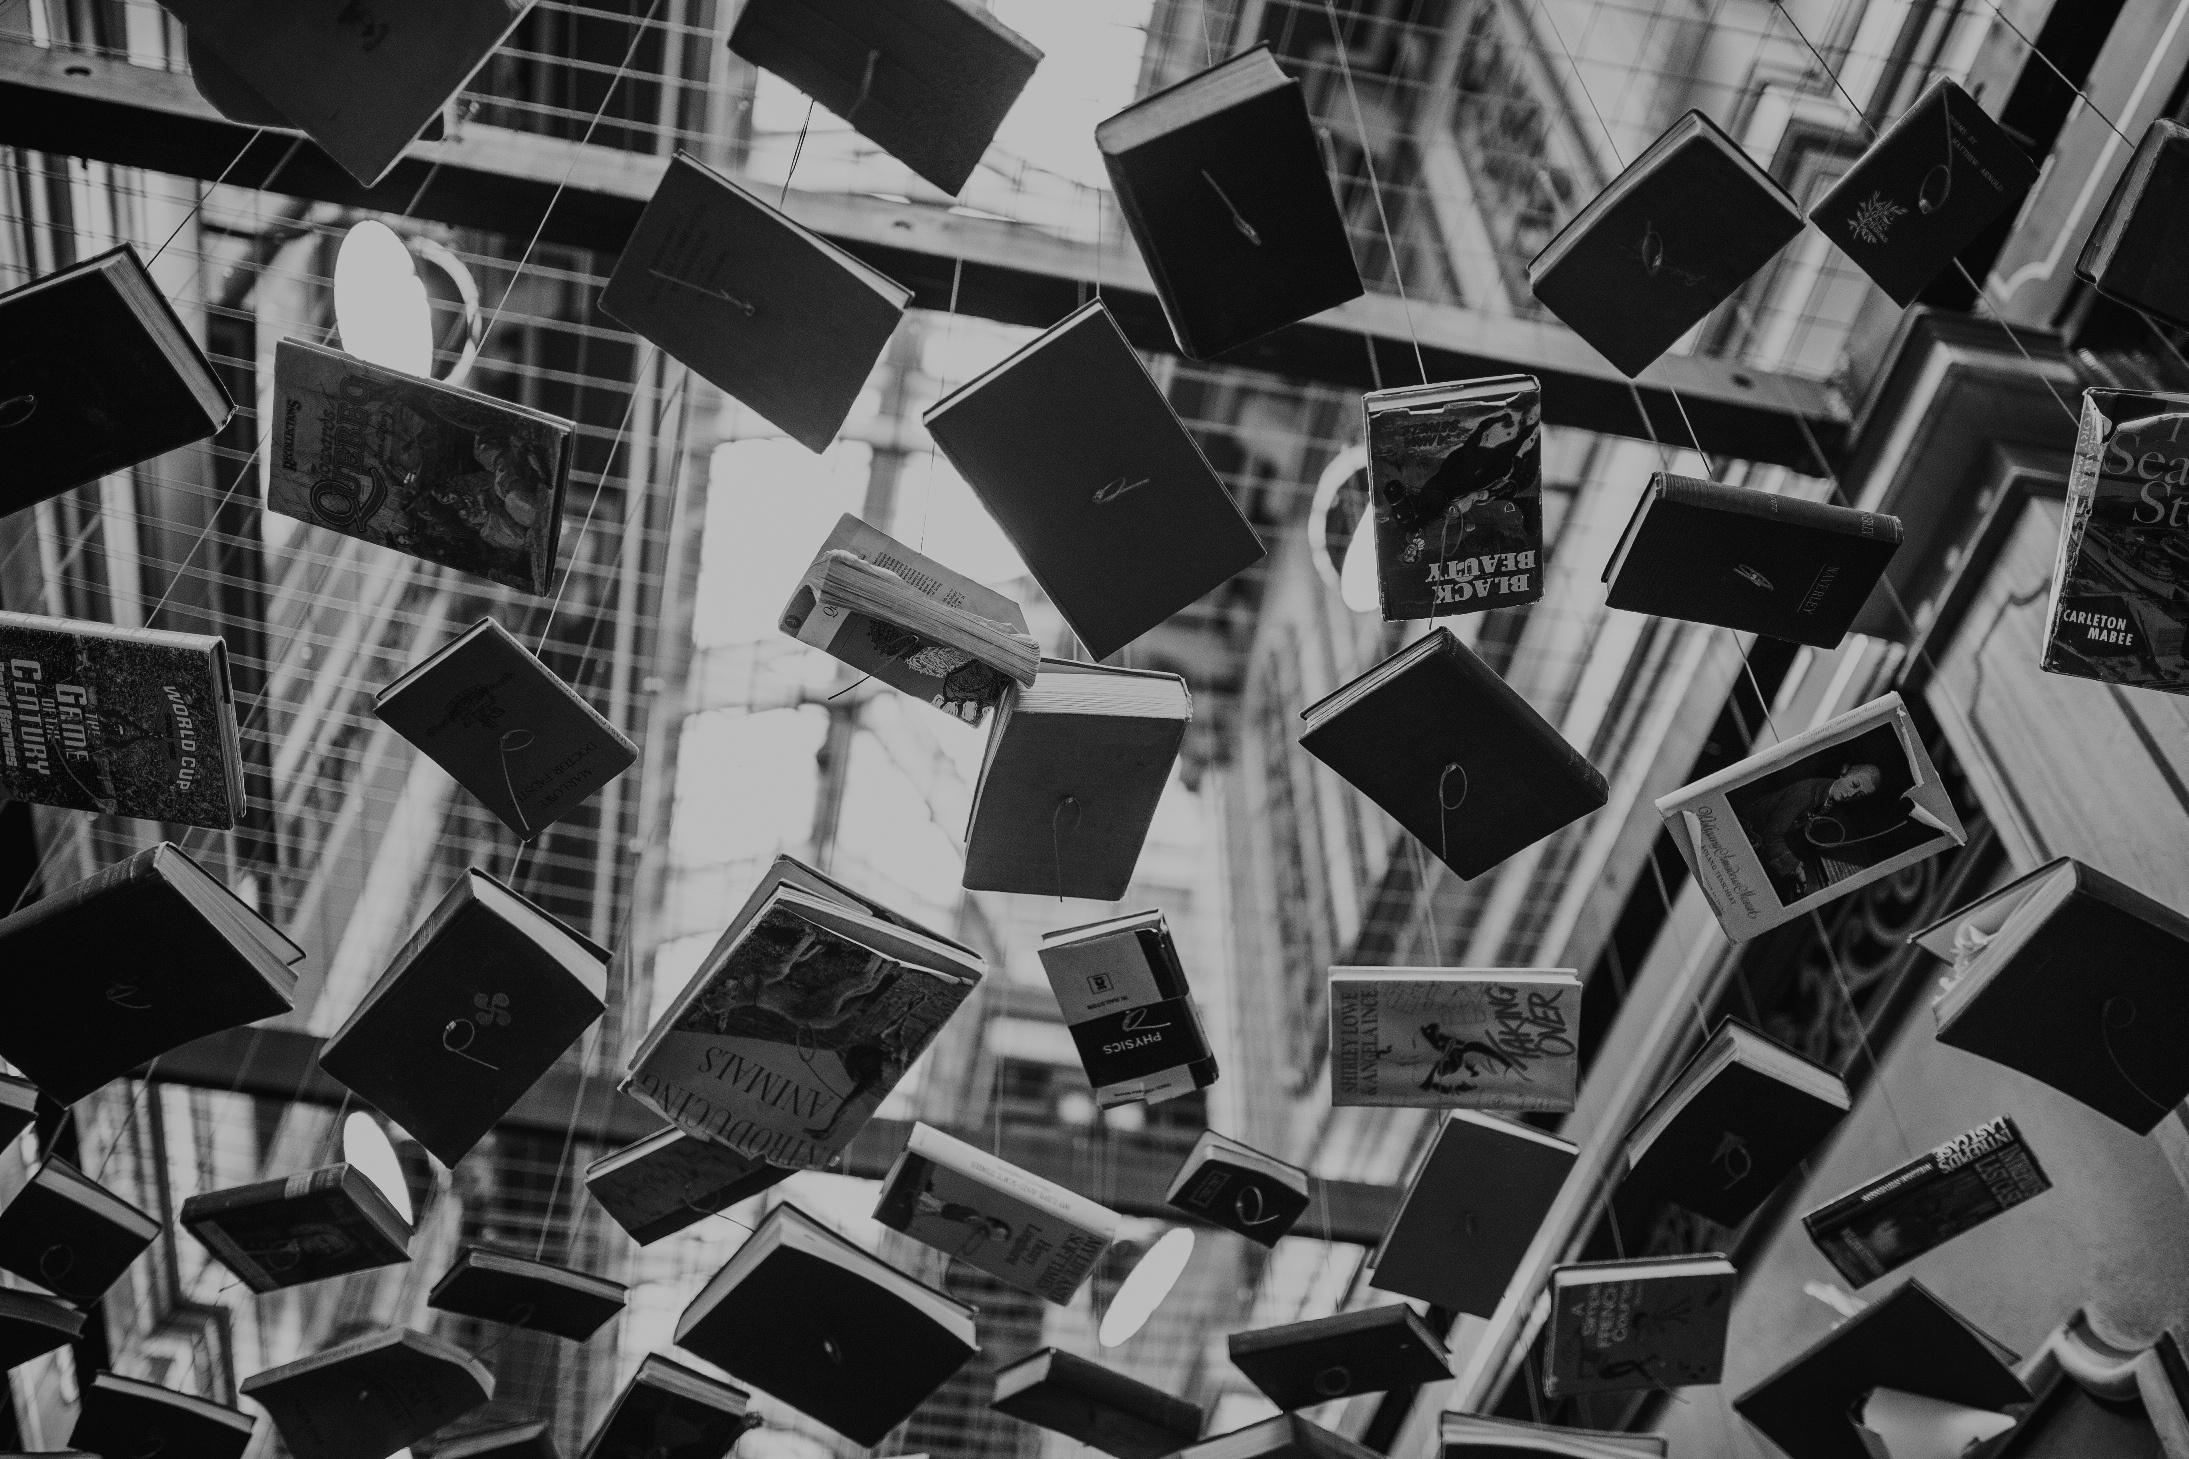 books dangling3.jpg